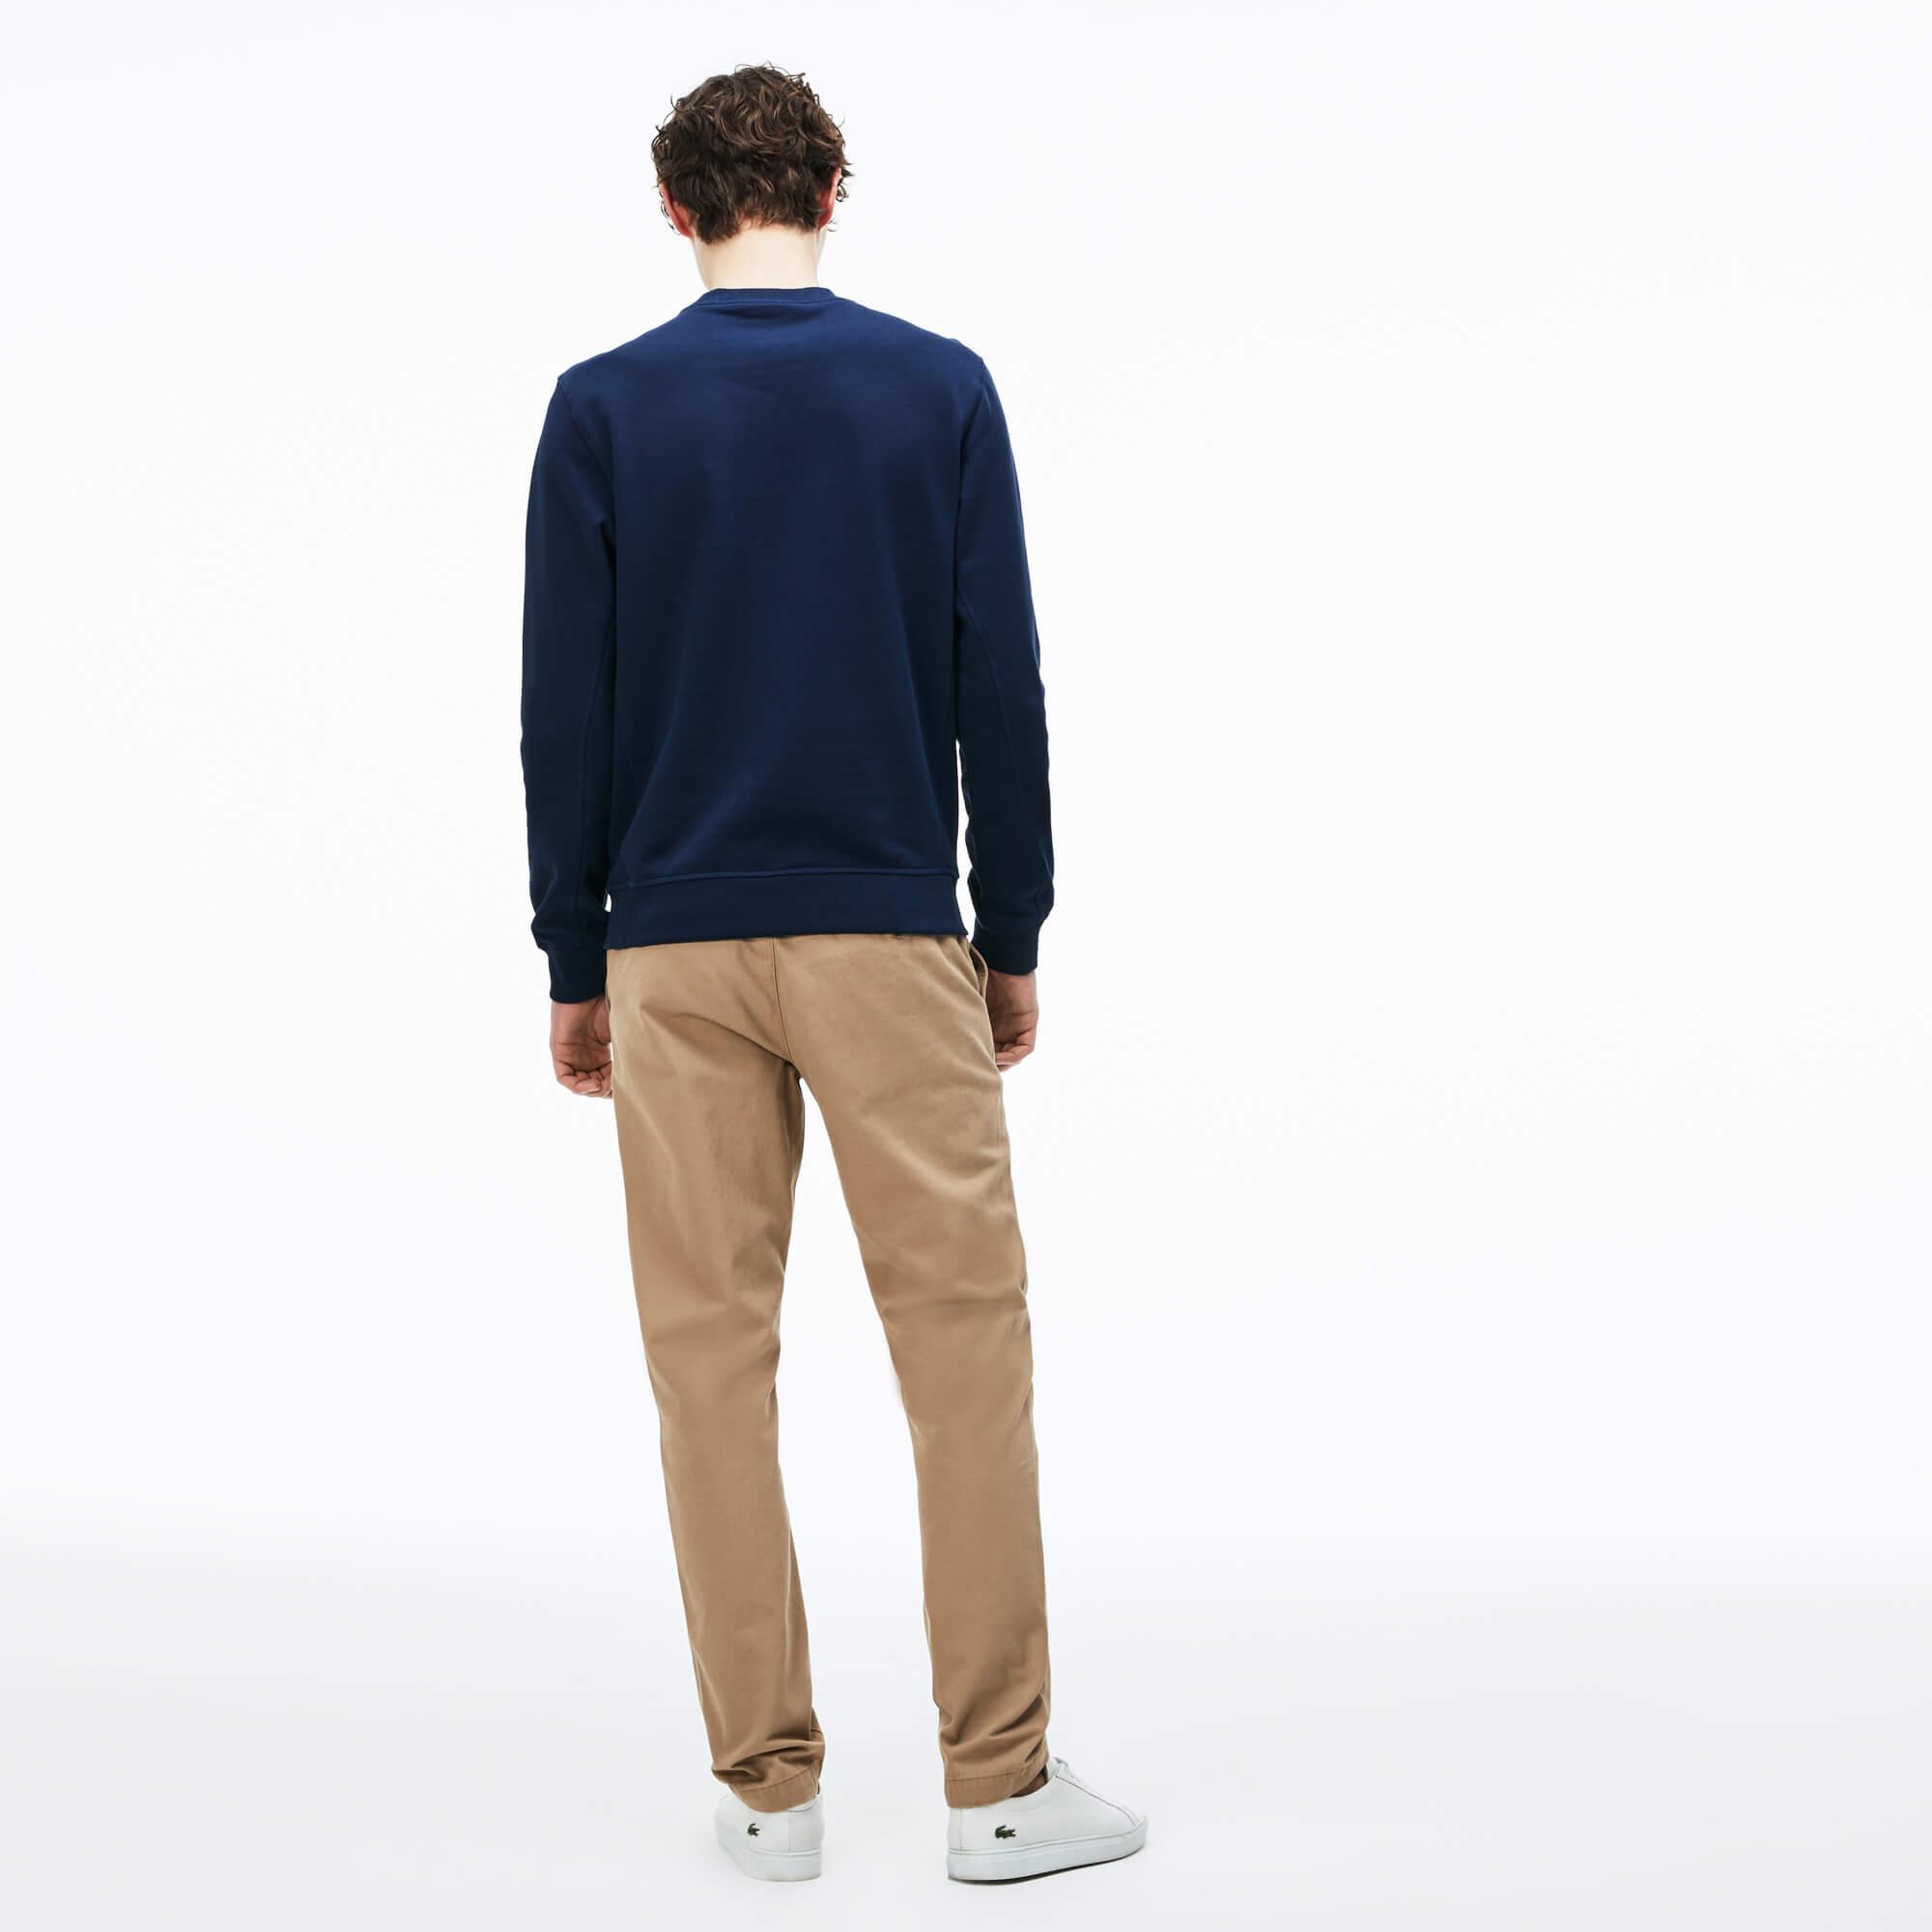 Lacoste Erkek Kahverengi Gabardin Pantolon